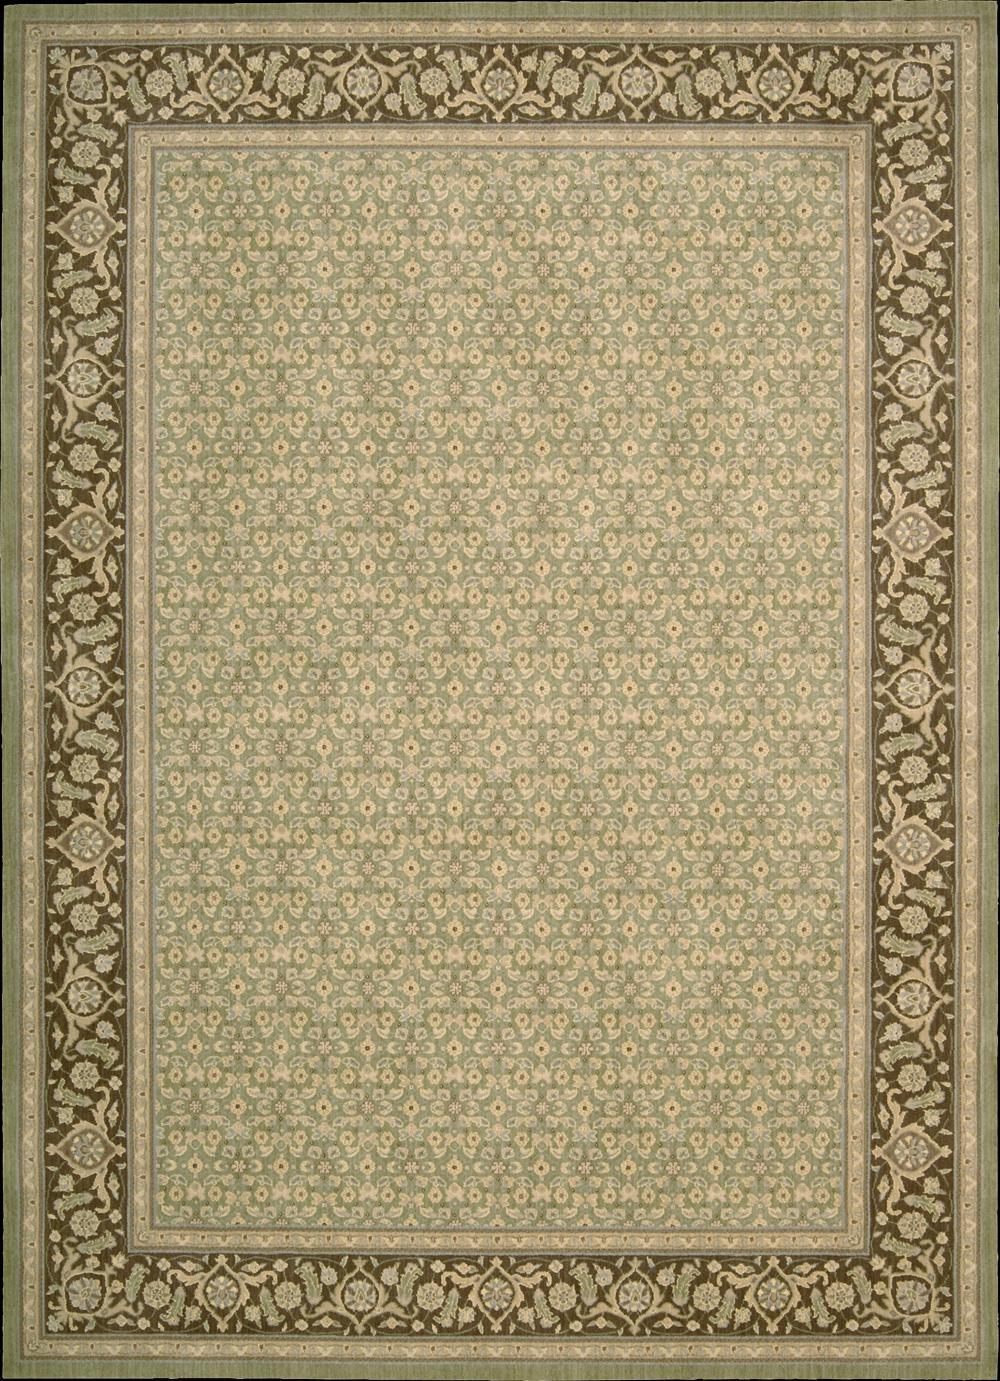 "Nourison Persian Empire Area Rug 2' x 2'9"" - Item Number: 44139"